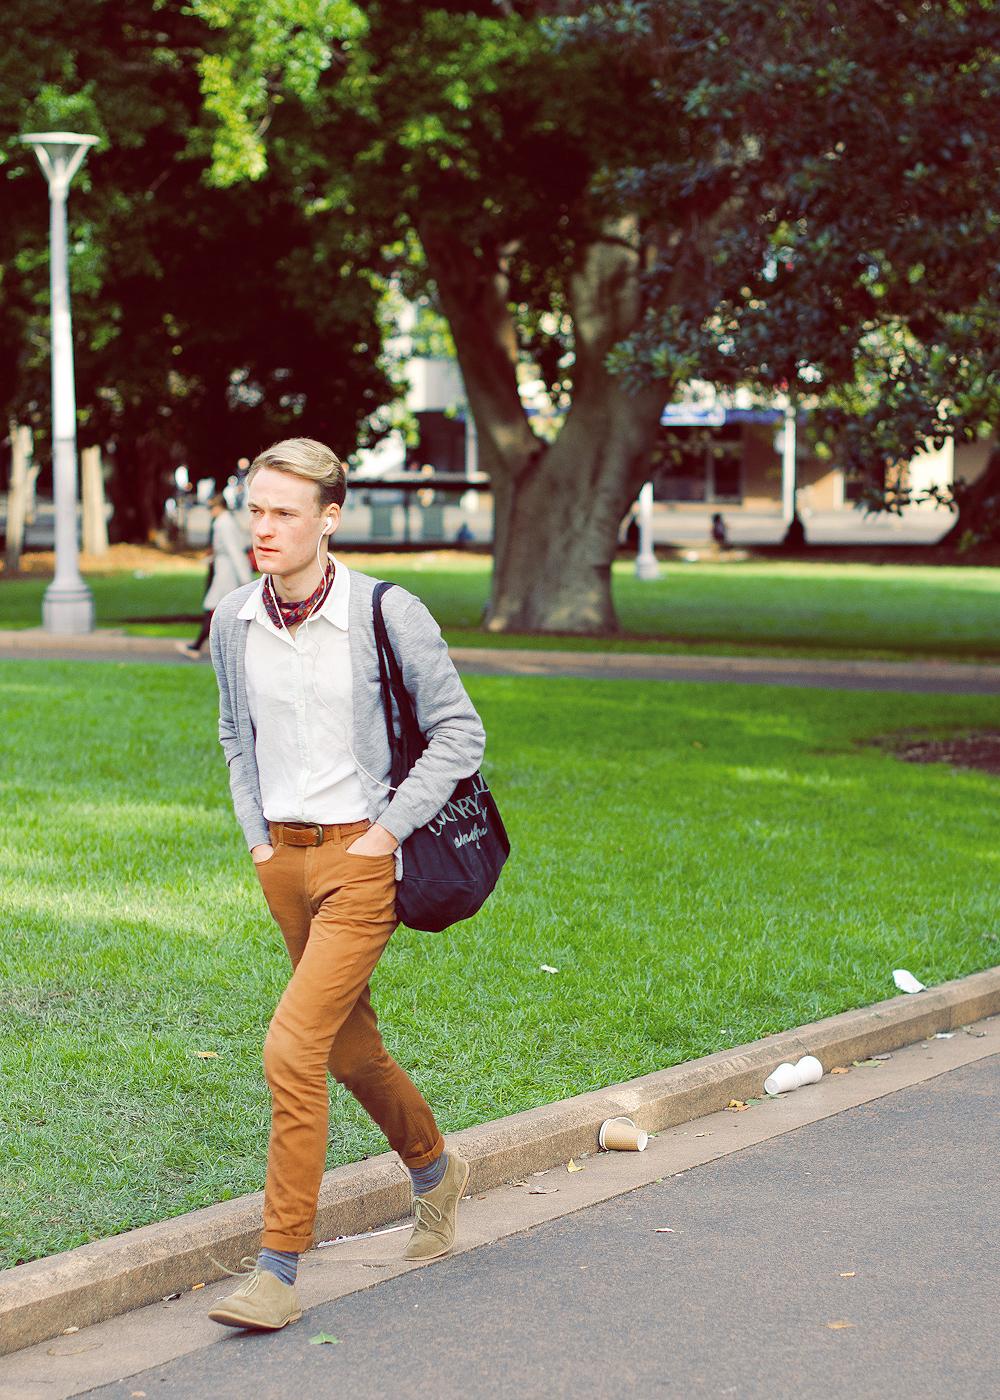 Park stroll.